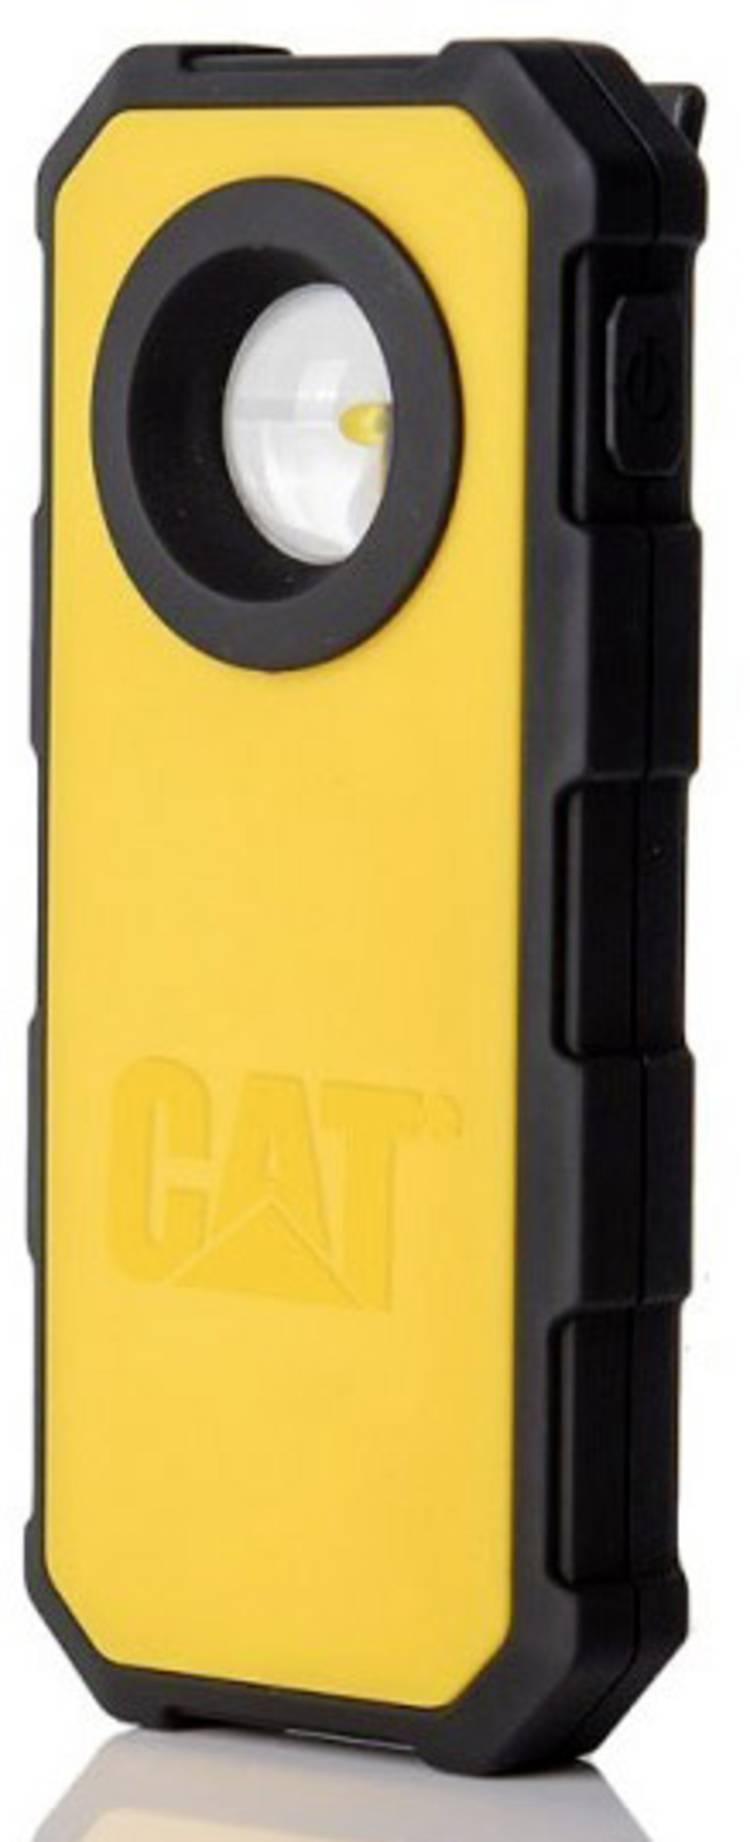 LED Platte werklamp werkt op batterijen CAT CT5120 Pocket Spot 220 lm